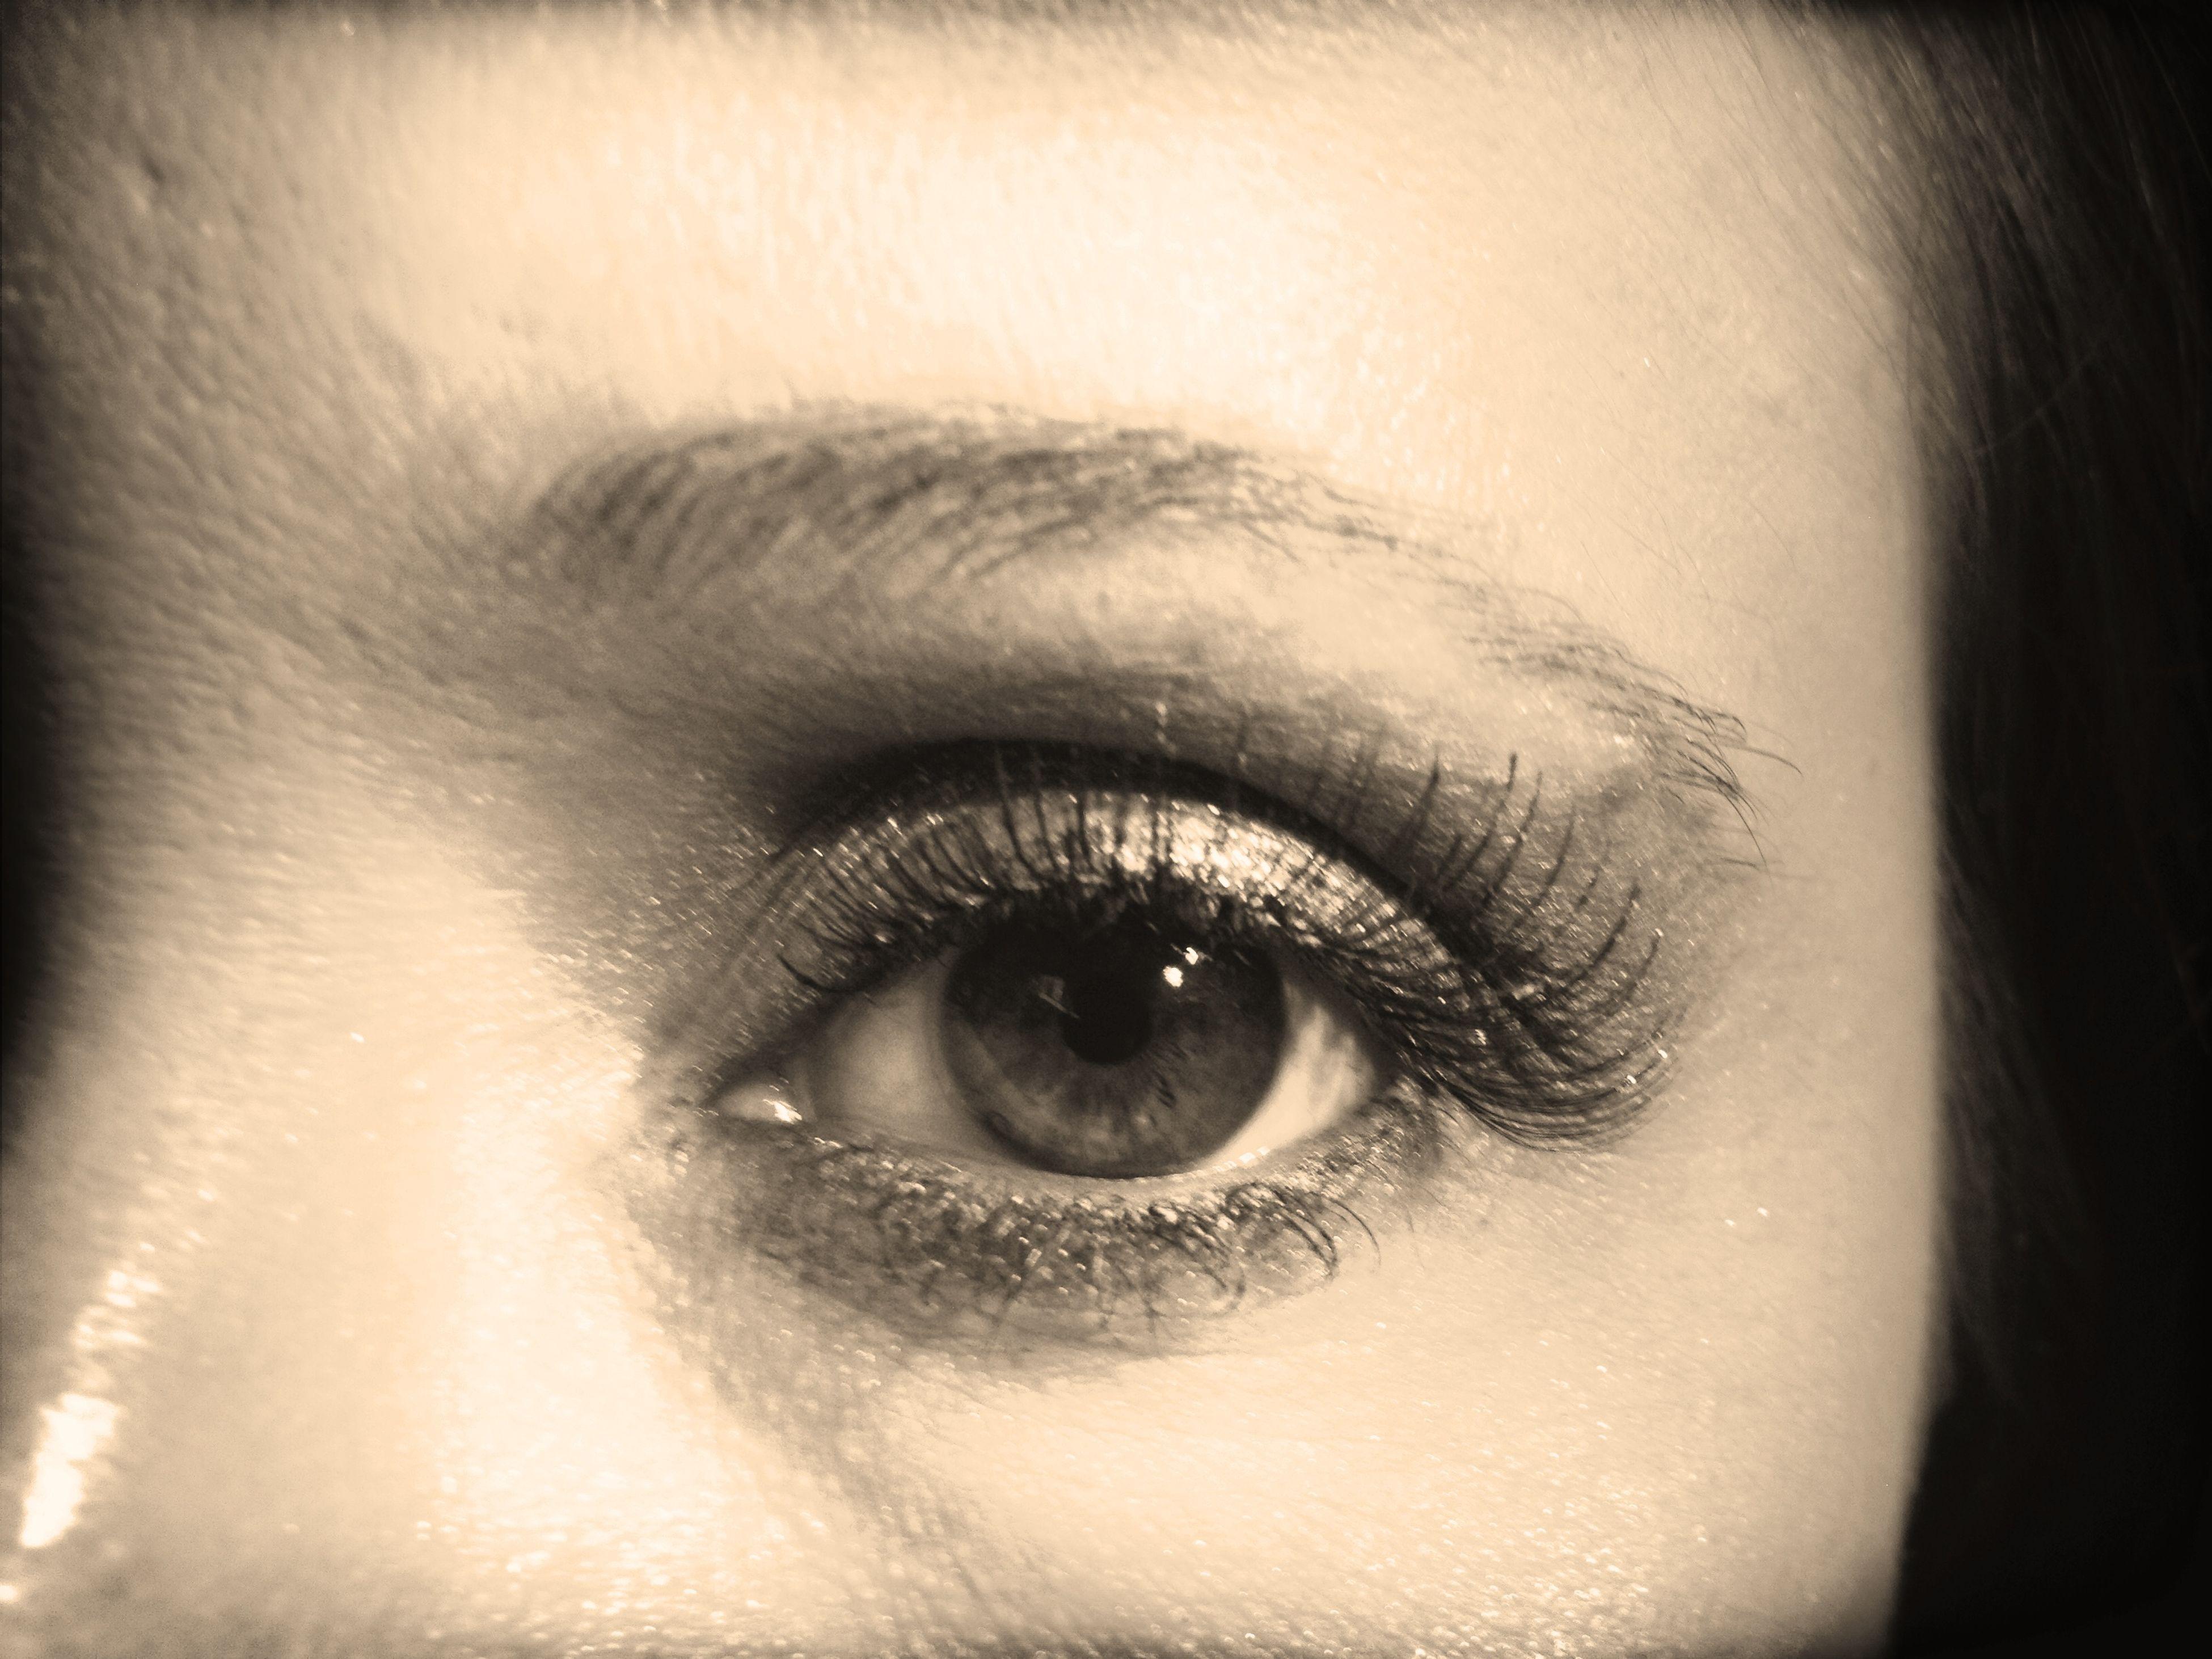 human eye, close-up, eyelash, looking at camera, portrait, human face, headshot, eyesight, part of, lifestyles, sensory perception, indoors, human skin, eyebrow, extreme close-up, person, extreme close up